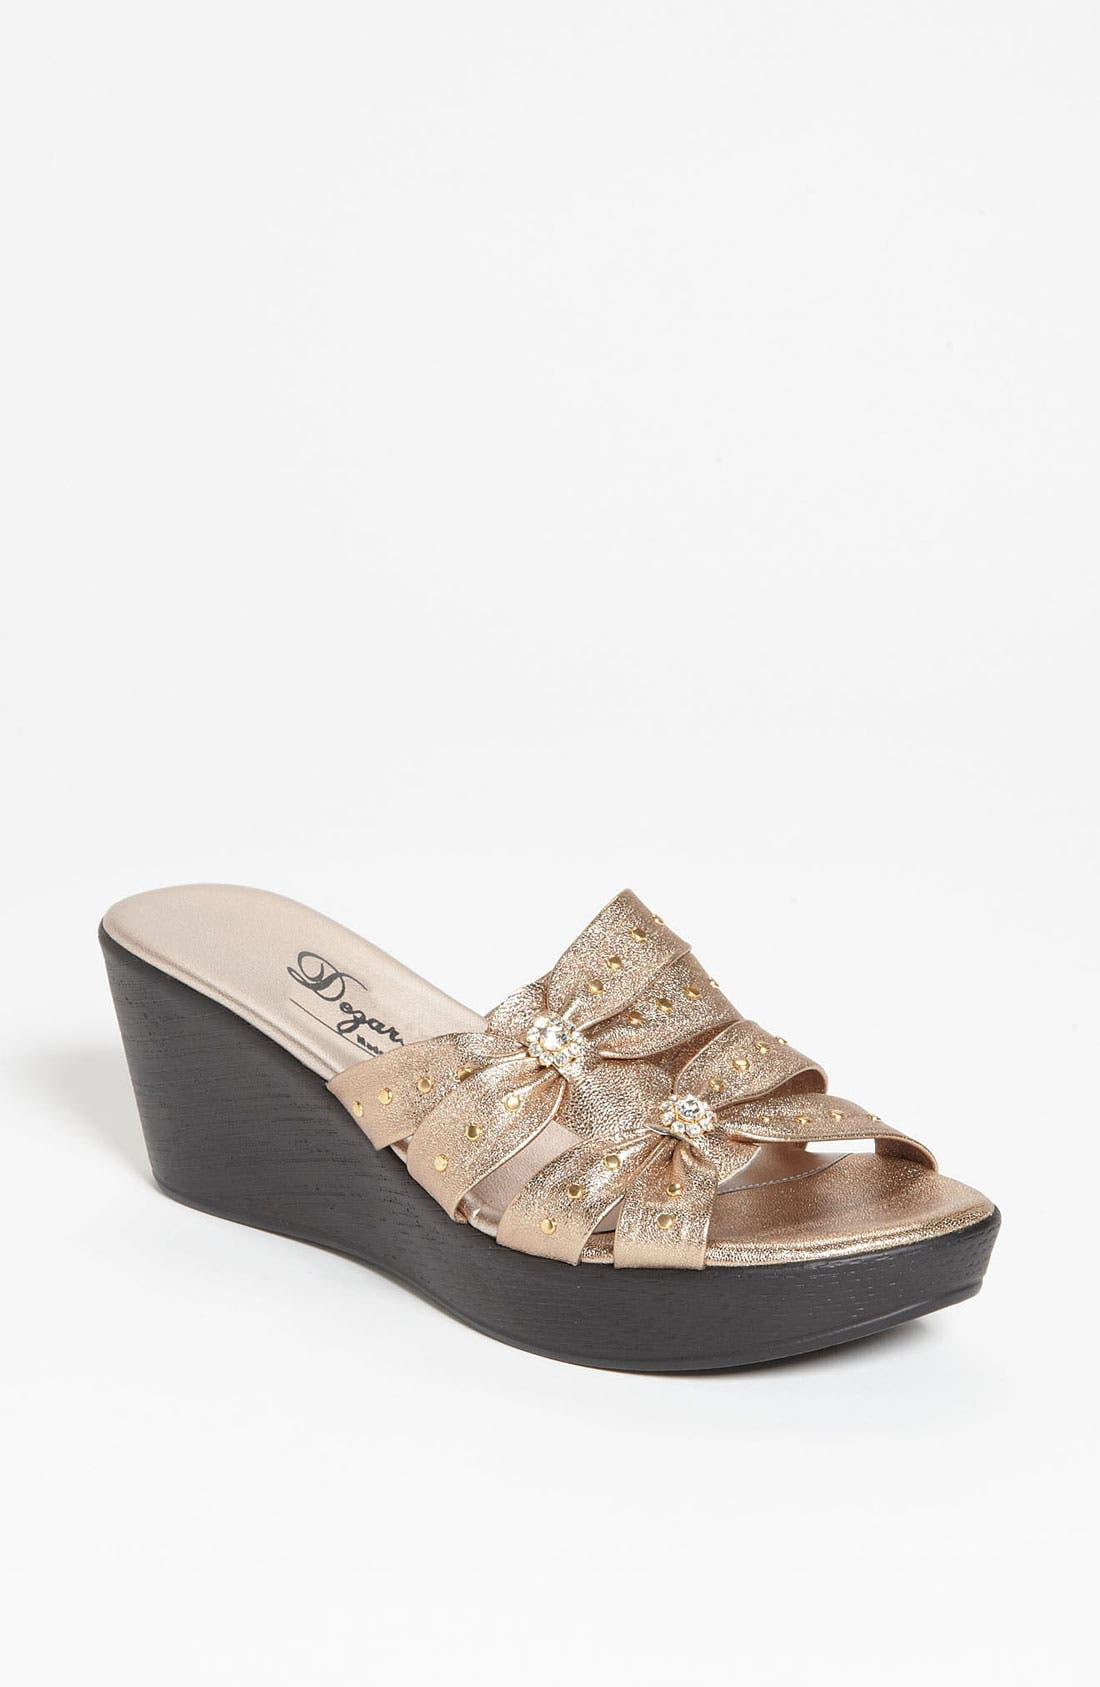 Main Image - Dezario 'Taline' Sandal (Special Purchase)